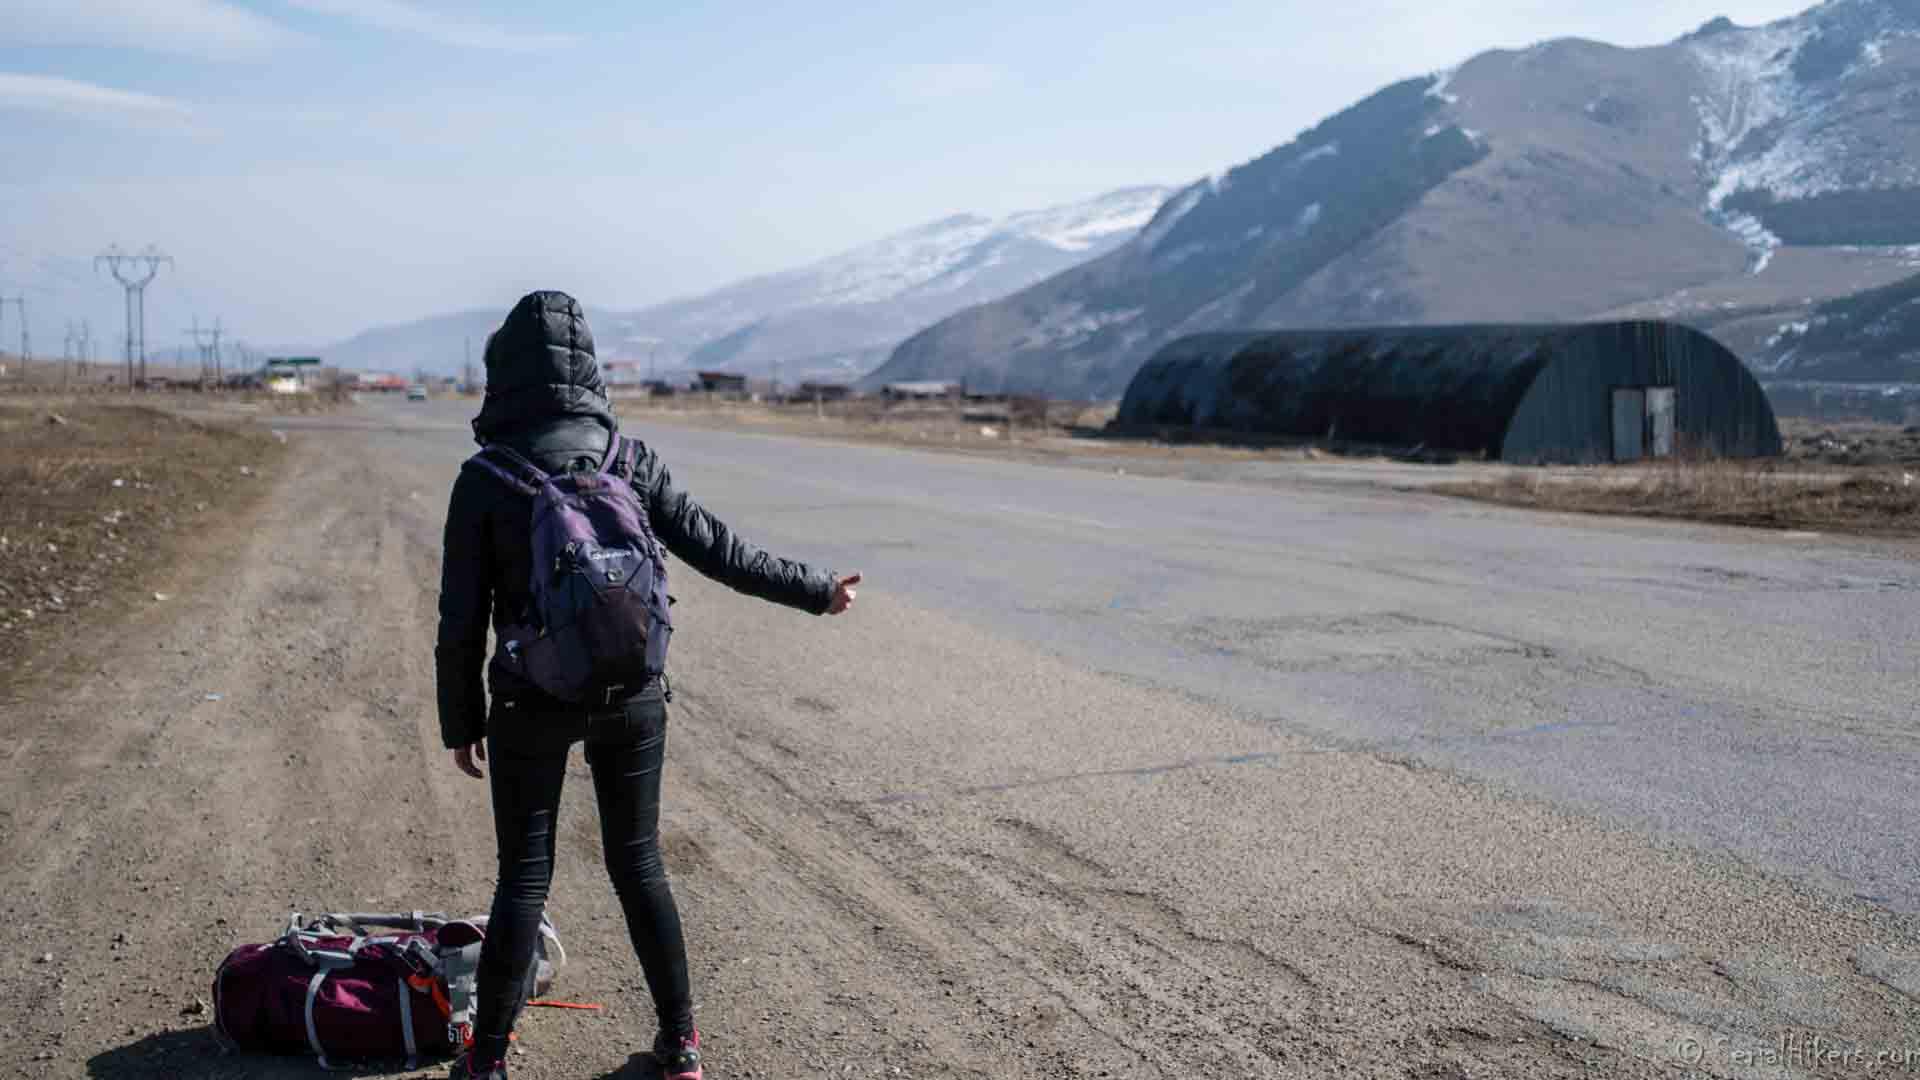 SerialHikers stop autostop world monde tour hitchhiking aventure adventure alternative travel voyage sans avion no fly premiere fois first time experience